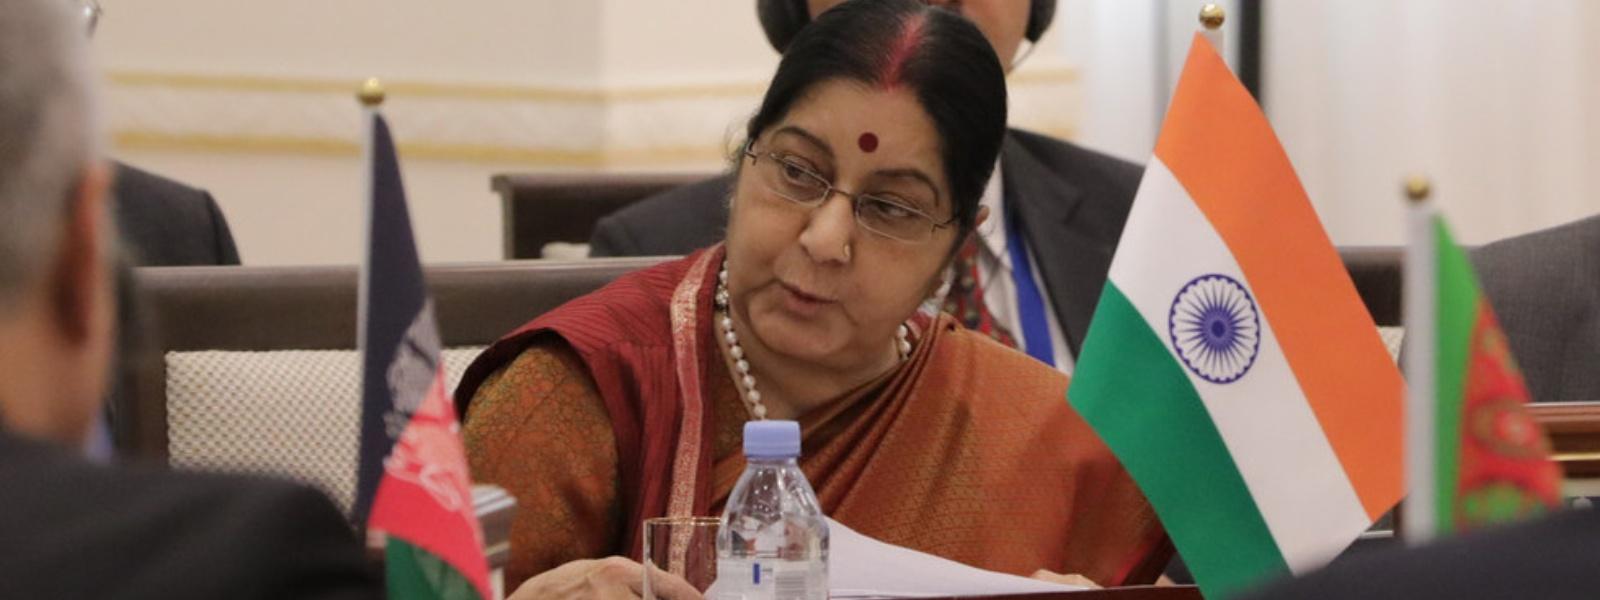 Former Indian External Affairs Minister Sushma Swaraj passes away